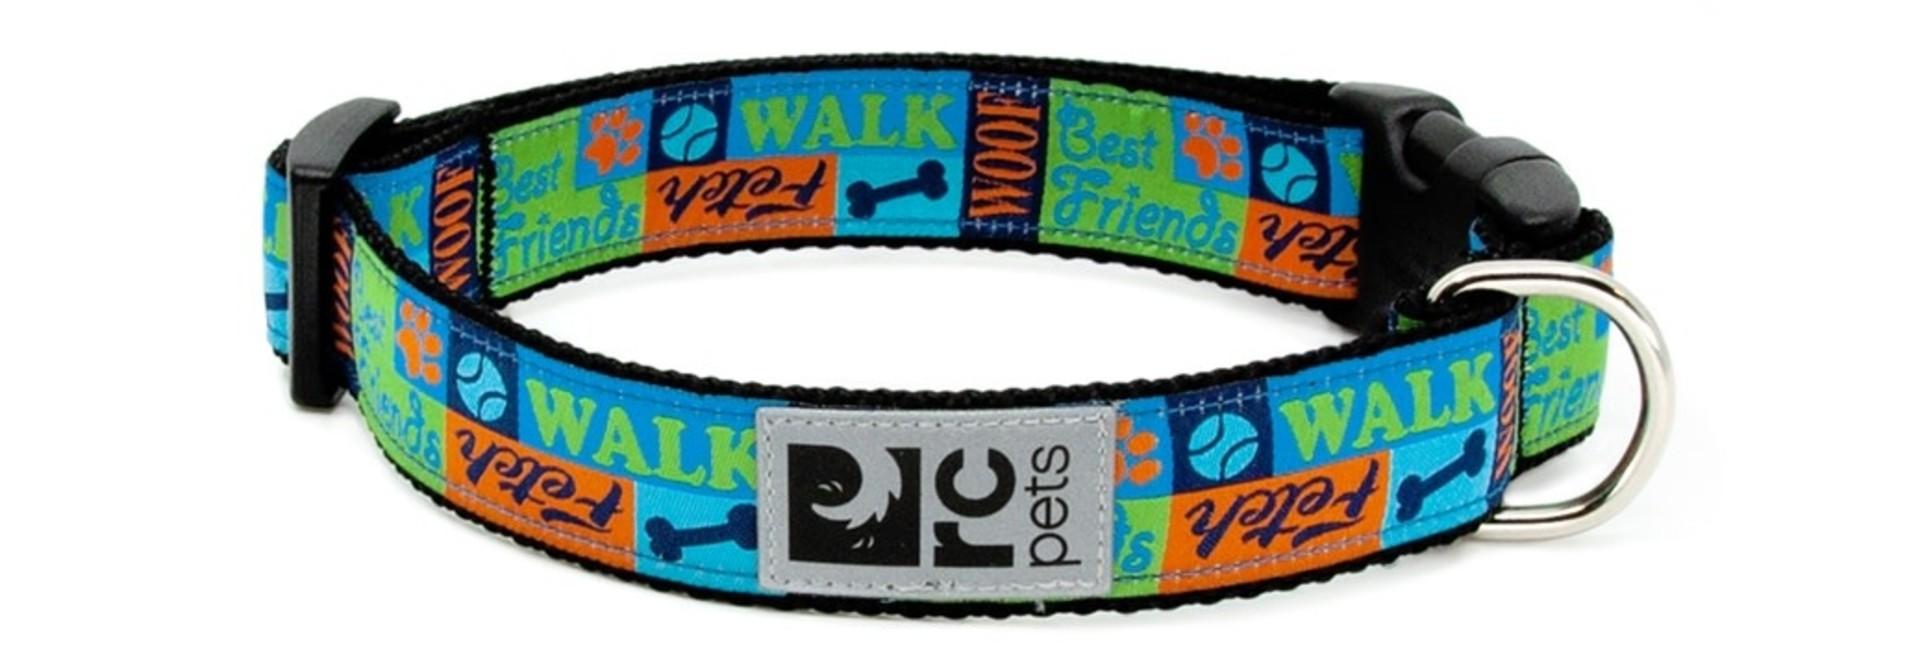 "Clip Collar Small 3/4"" Best Friends"